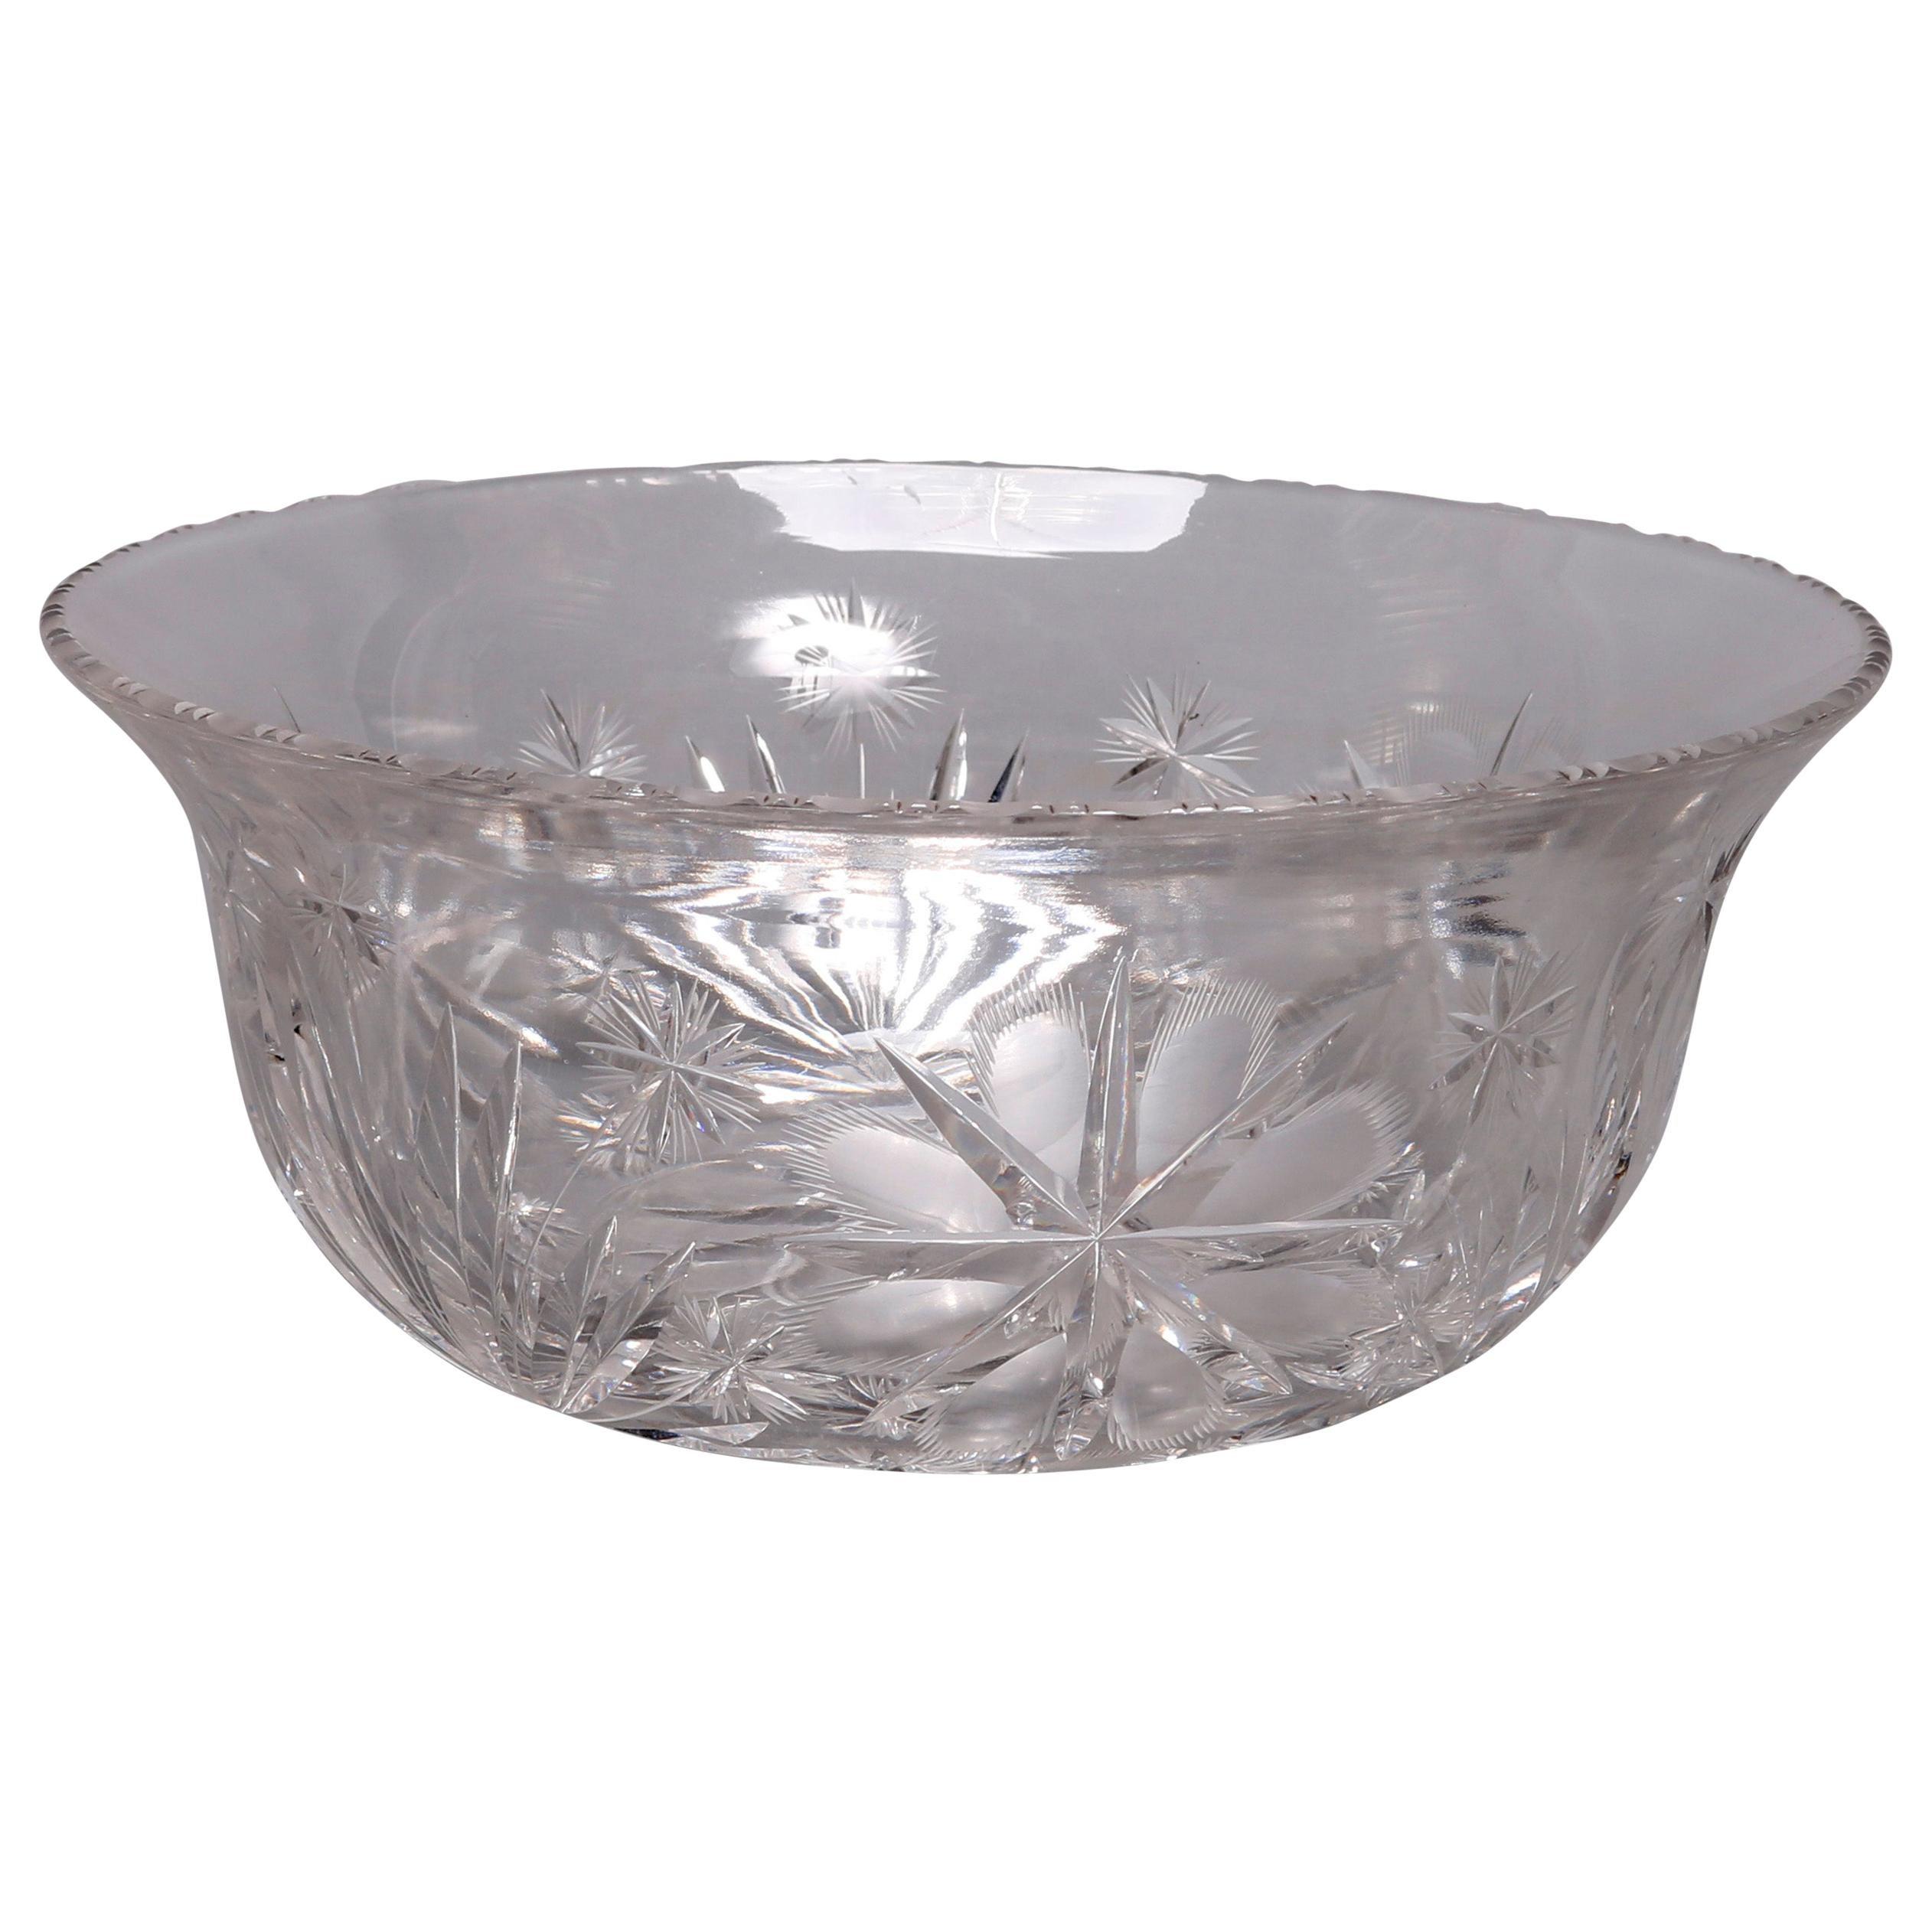 Antique Brilliant Cut Glass Serving Bowl, 20th Century